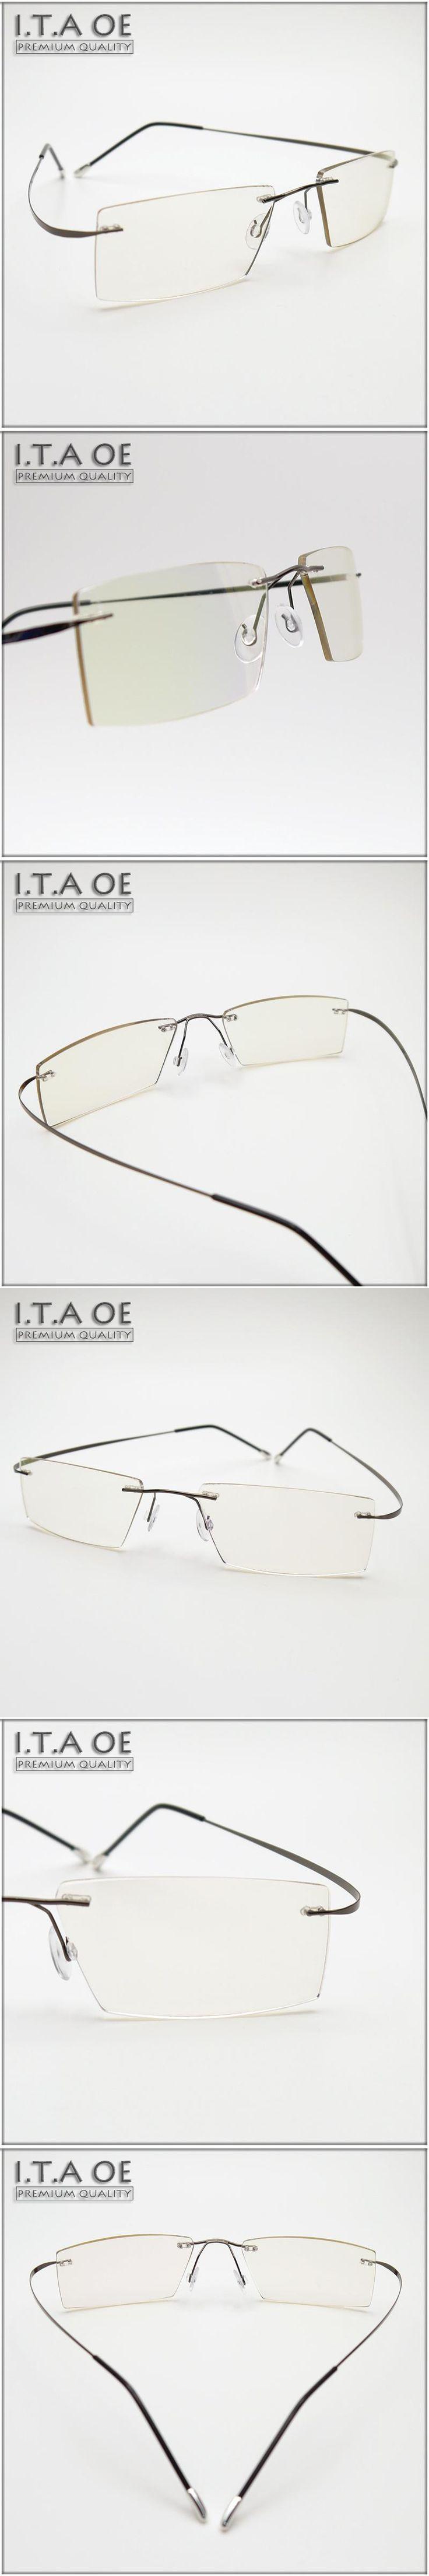 ITAOE Ivanov Rimless Style Business Only 10g Memory Alloy Men Women Myopia Reading Optical Eyewear Frames Glasses Spectacles